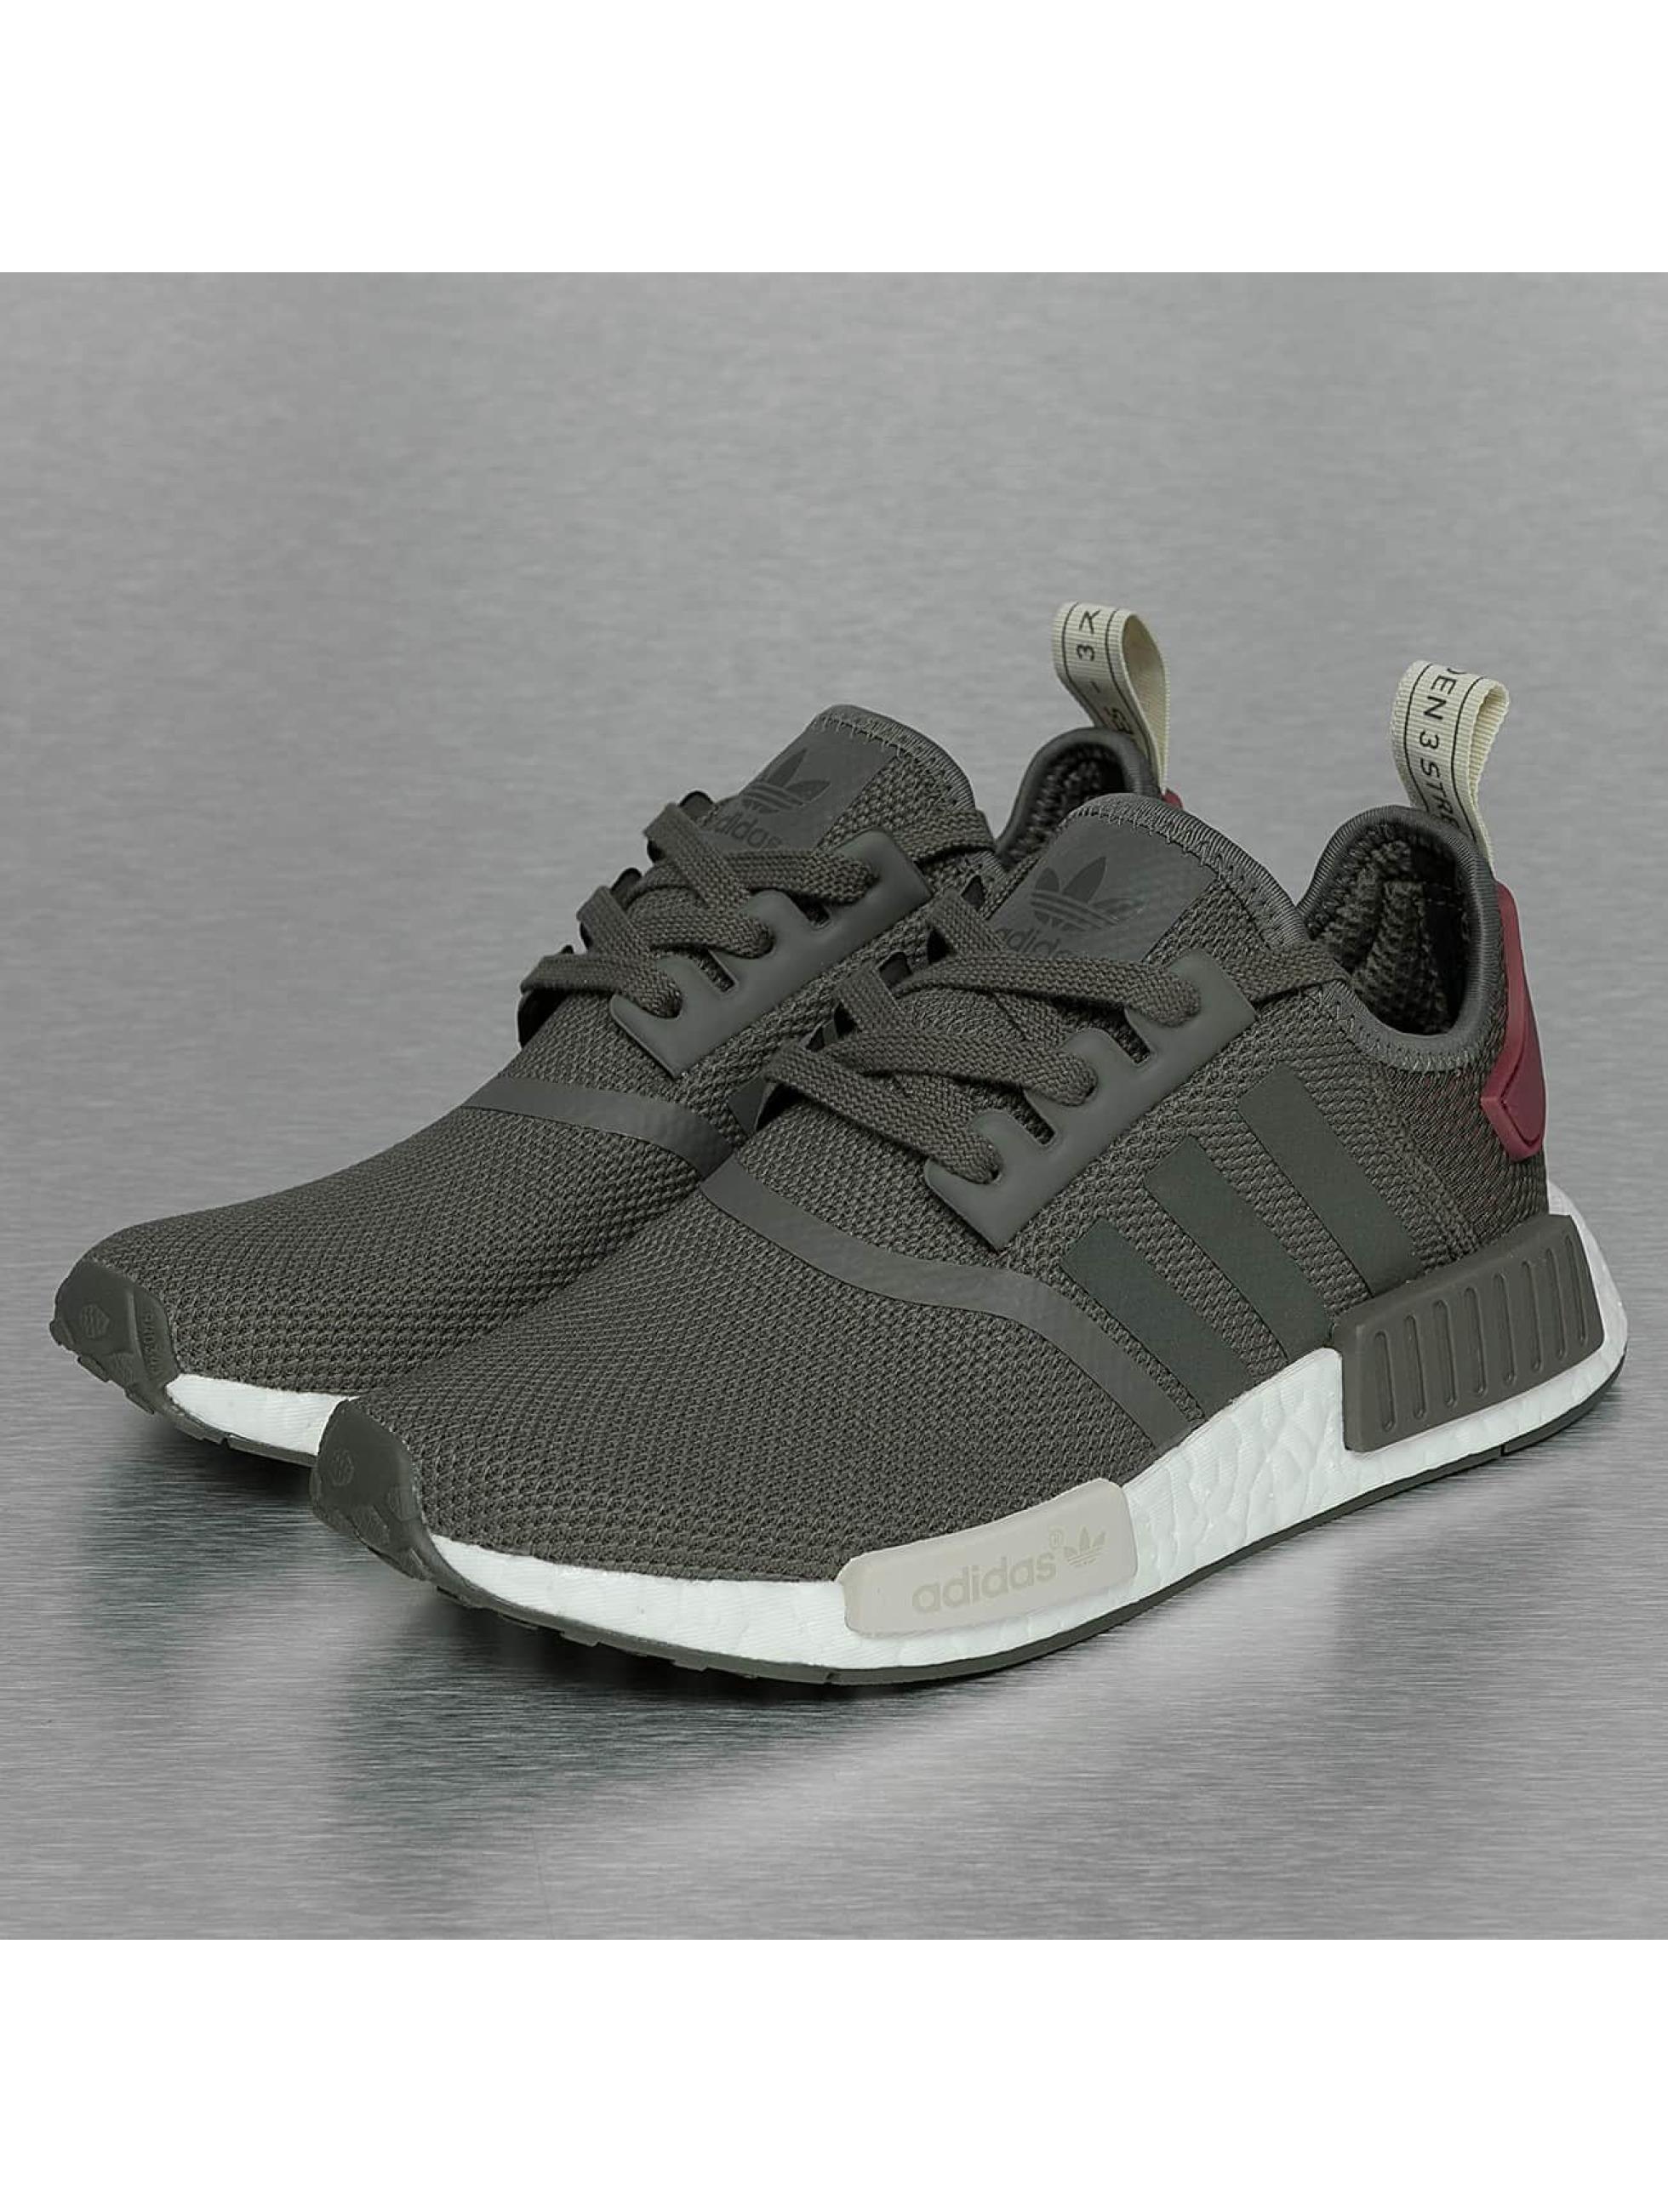 Adidas Nmd R1 Grau Oliv